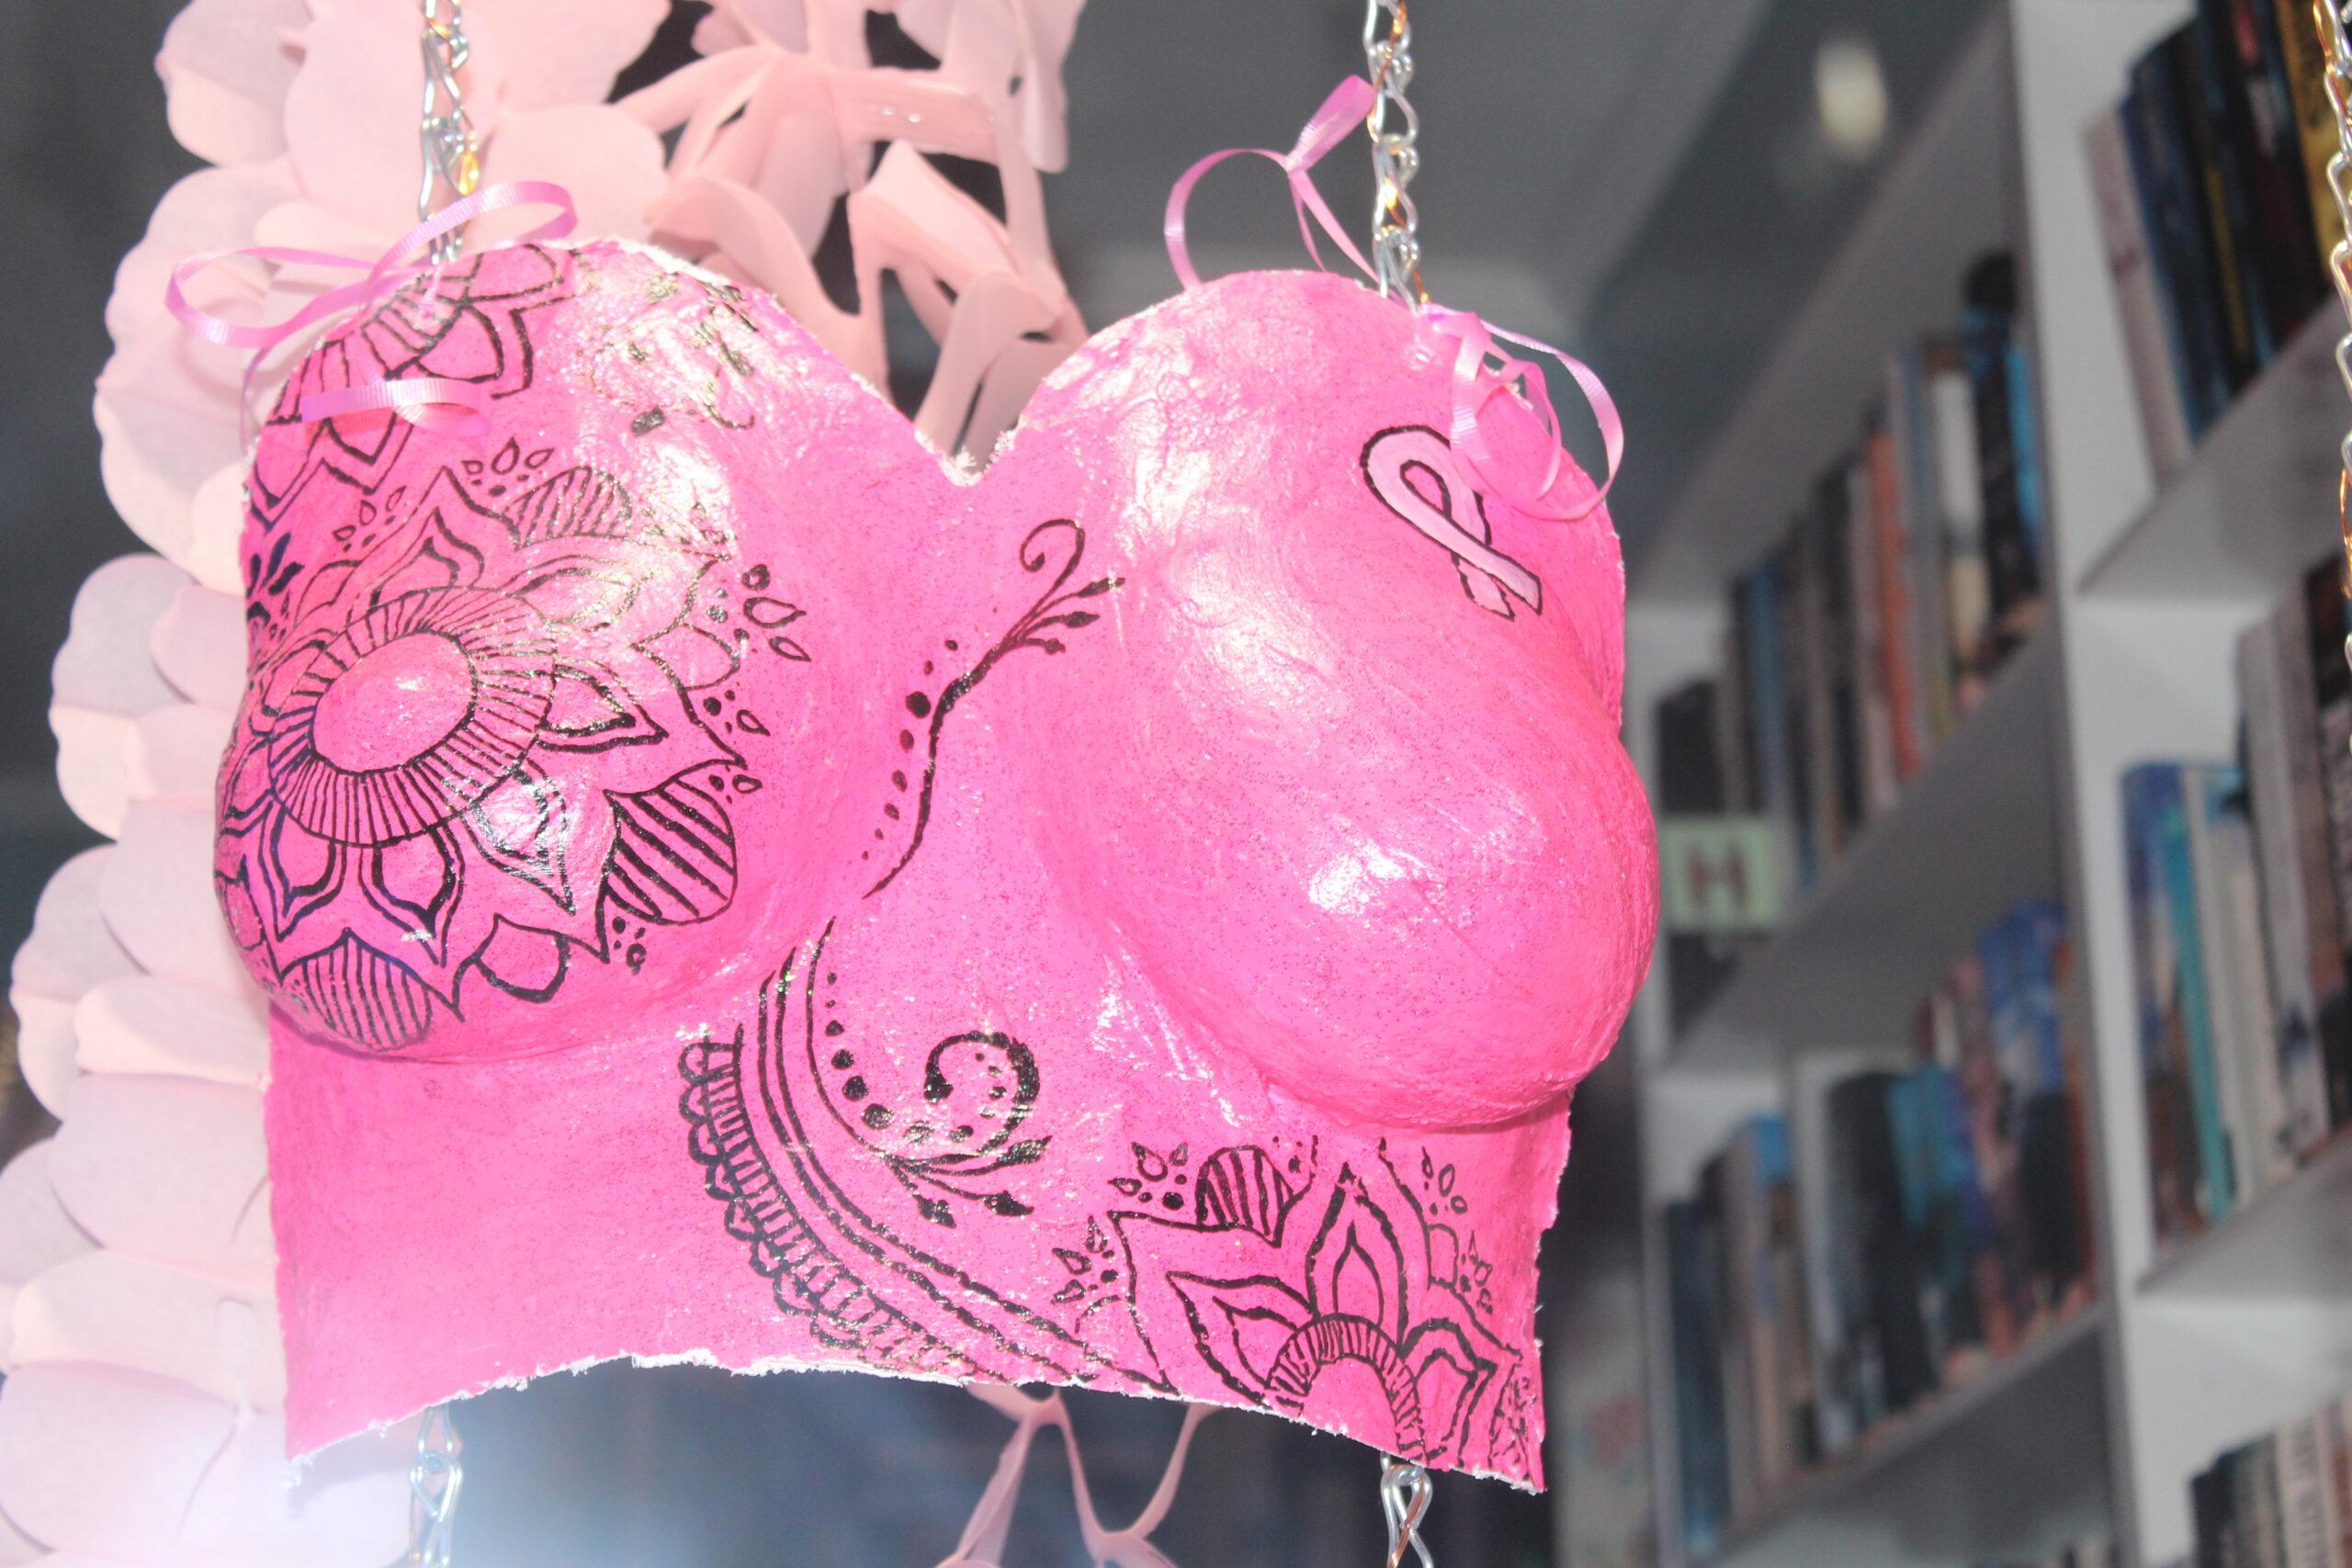 Pink cast.